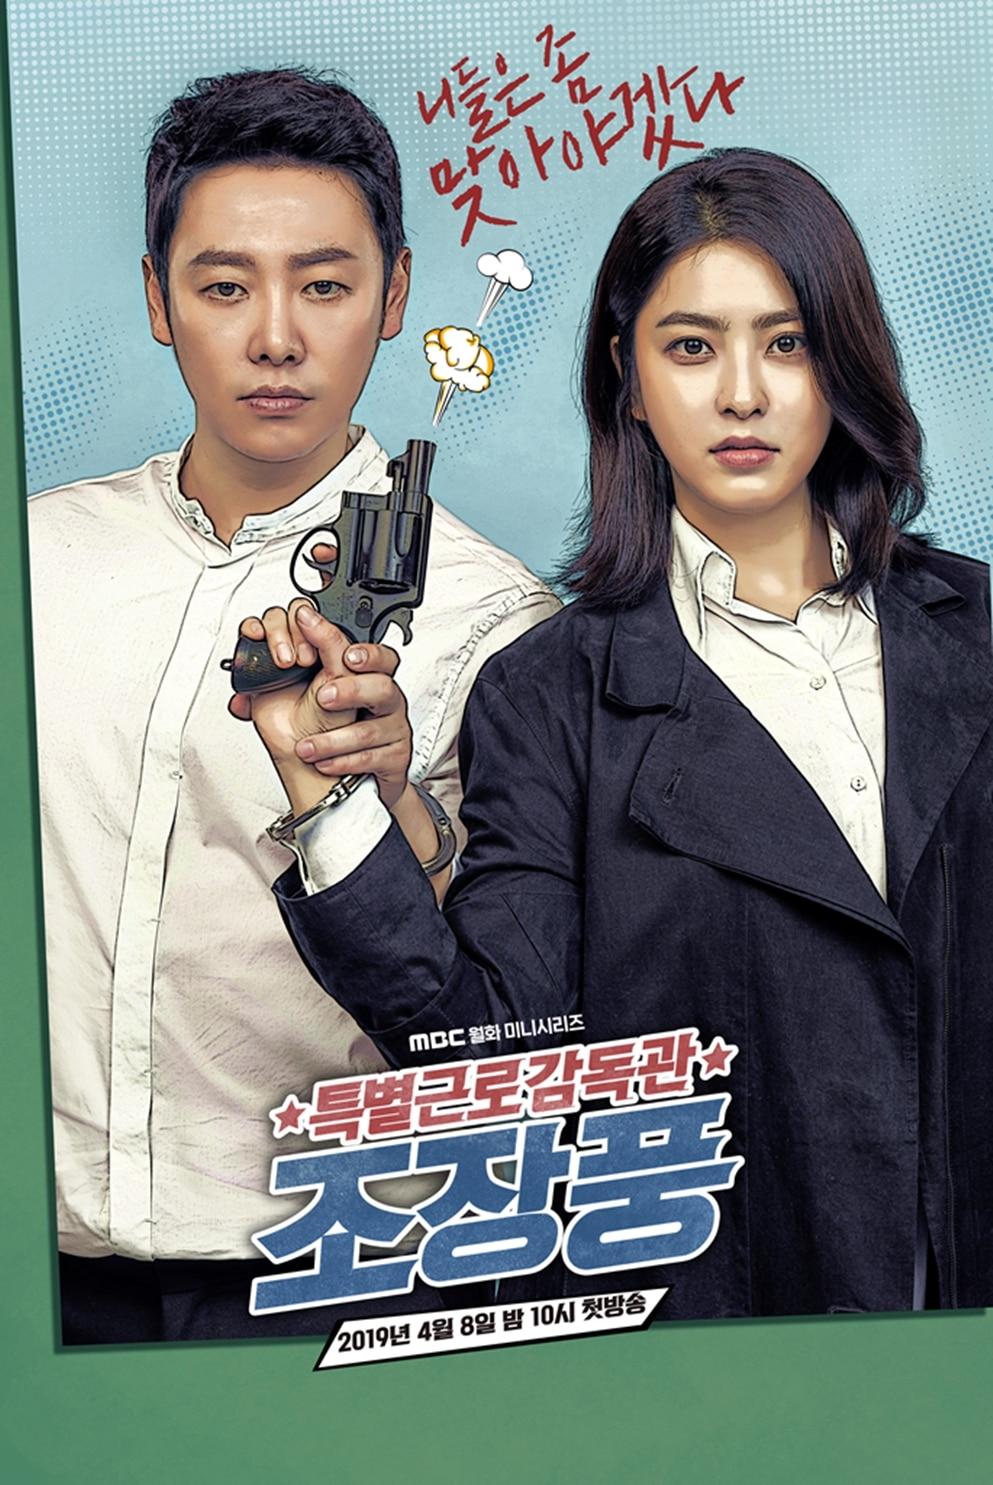 Special Labor Inspector Jo - 특별근로감독관 조장풍